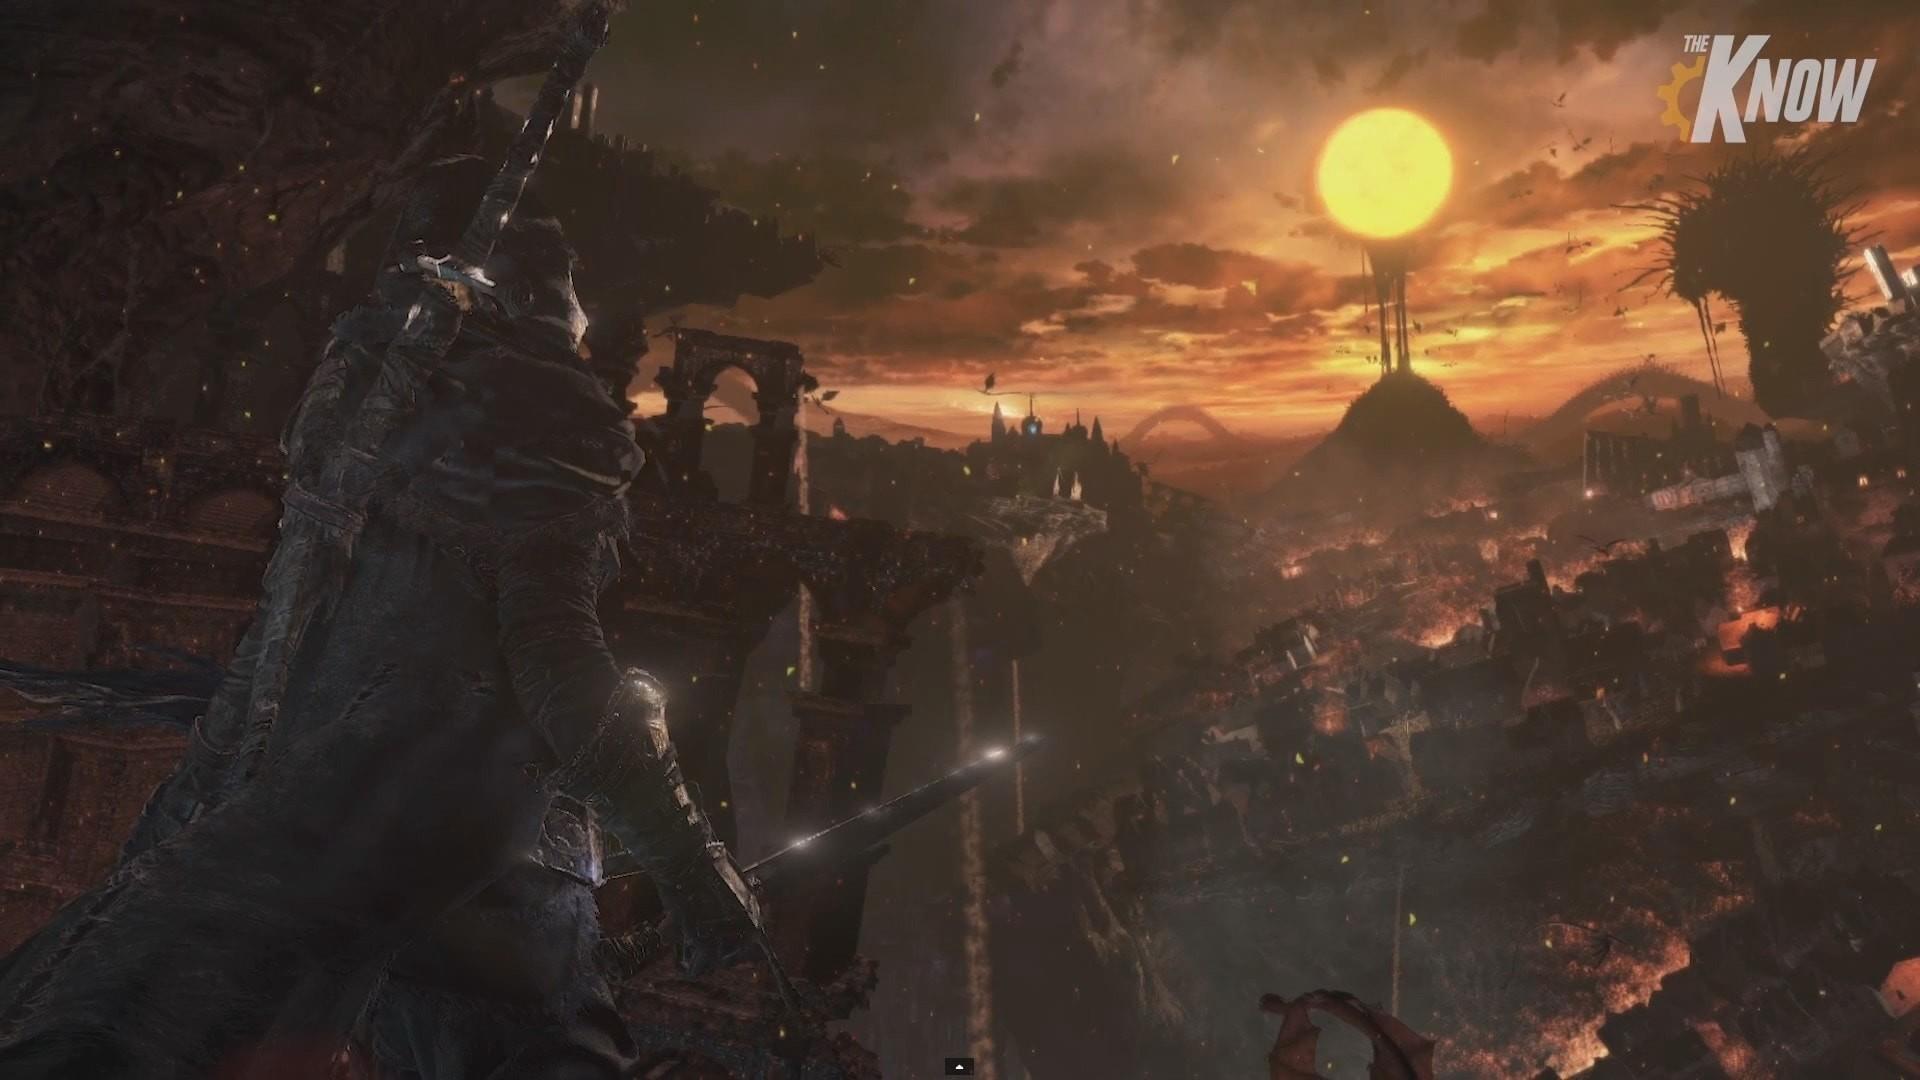 Dark Souls 3 Wallpapers